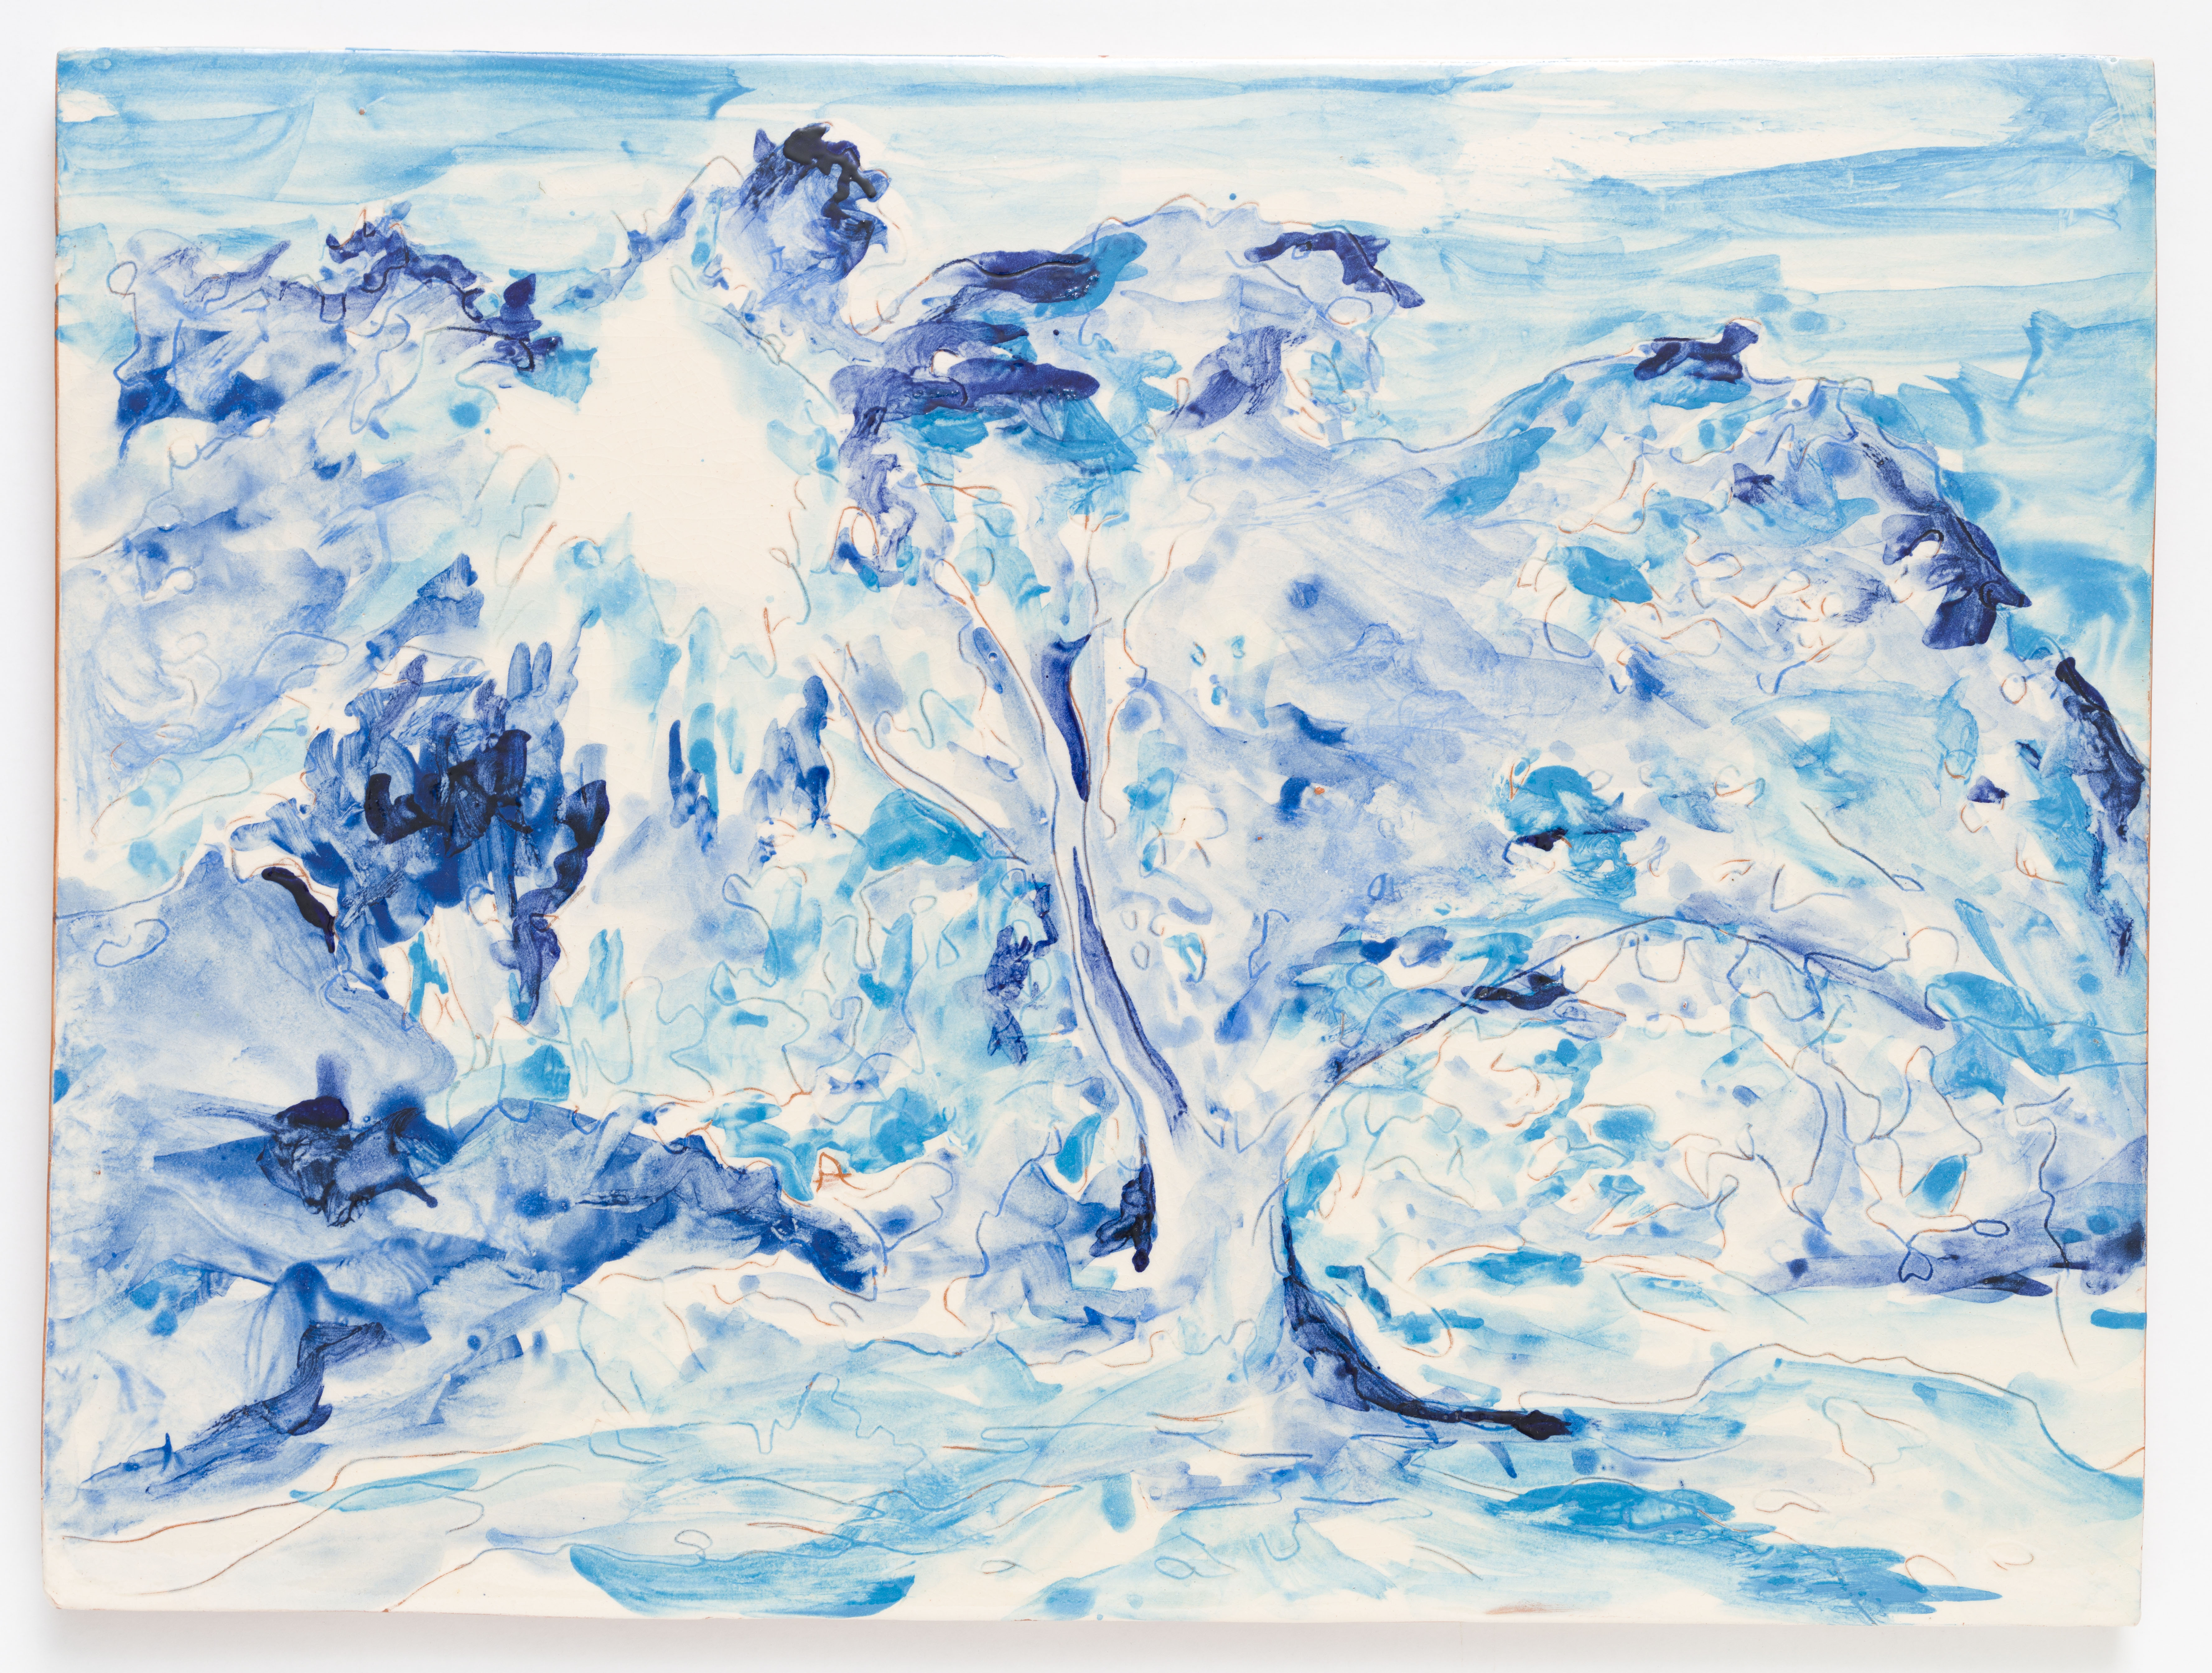 """Azulejo Azul II, painted ceramic tile, 30,5 x 40,5 cm., Portugal 2012"